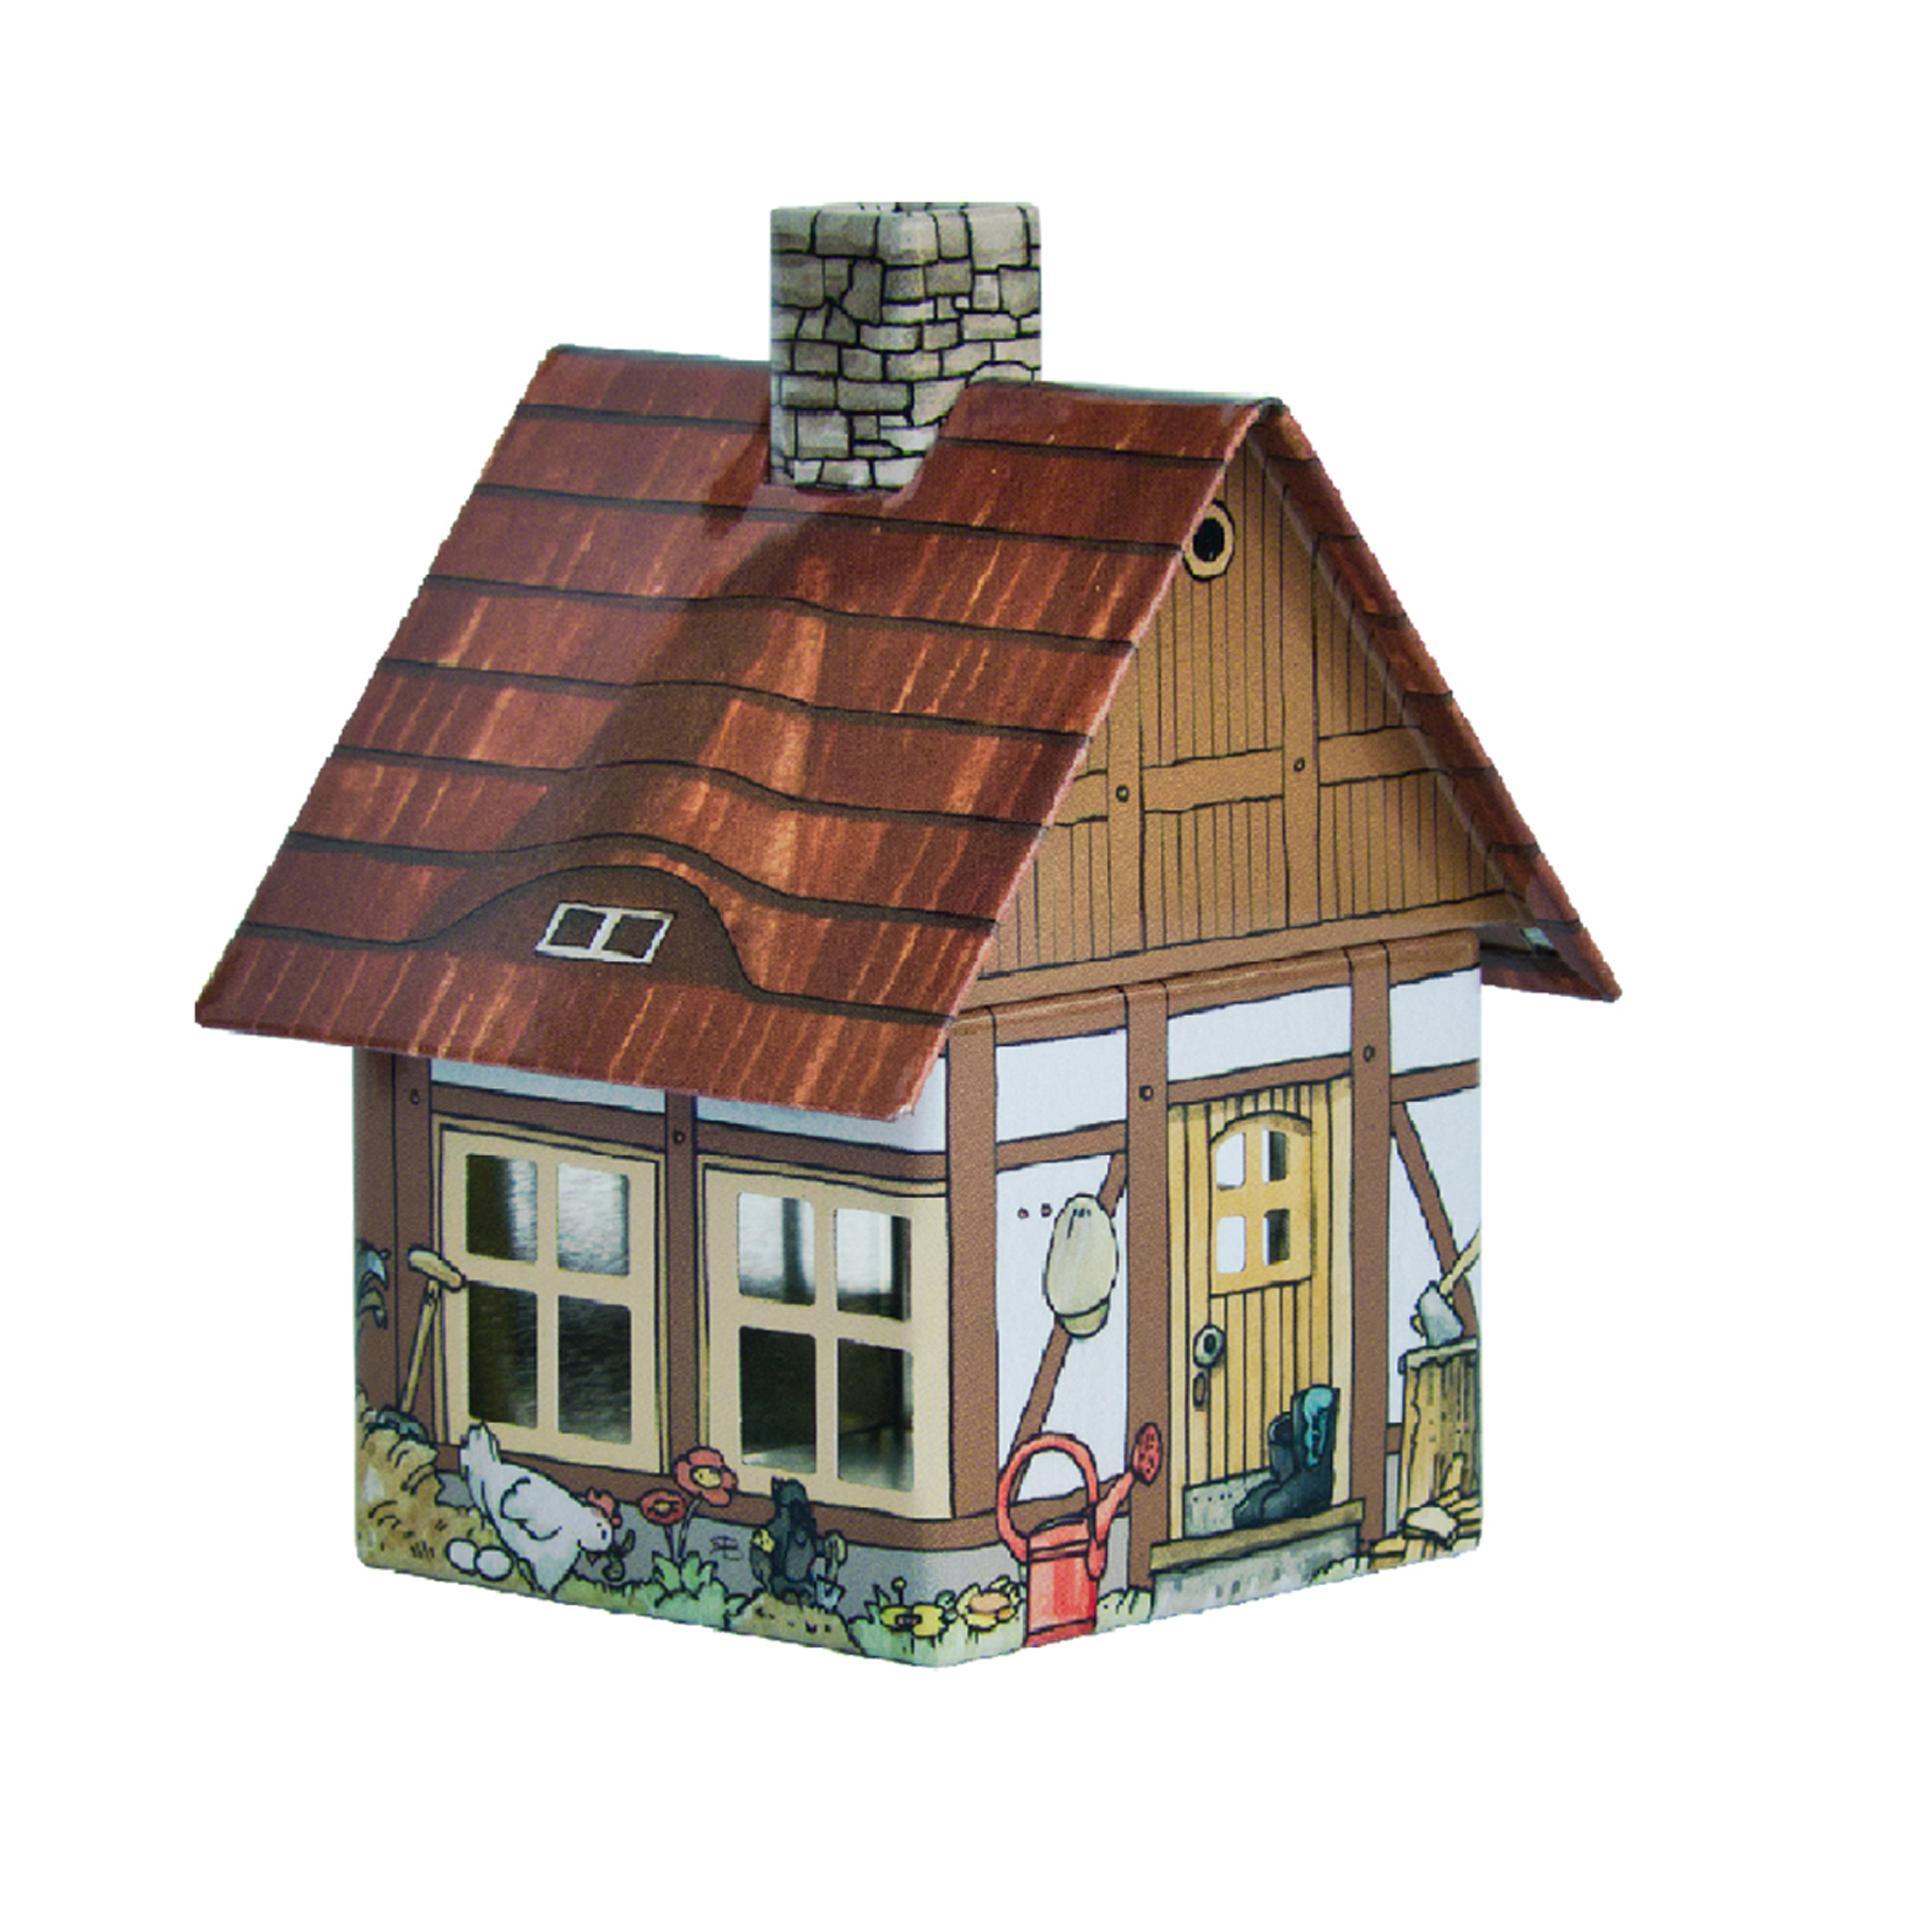 Rauchhaus Metall Bauernhaus